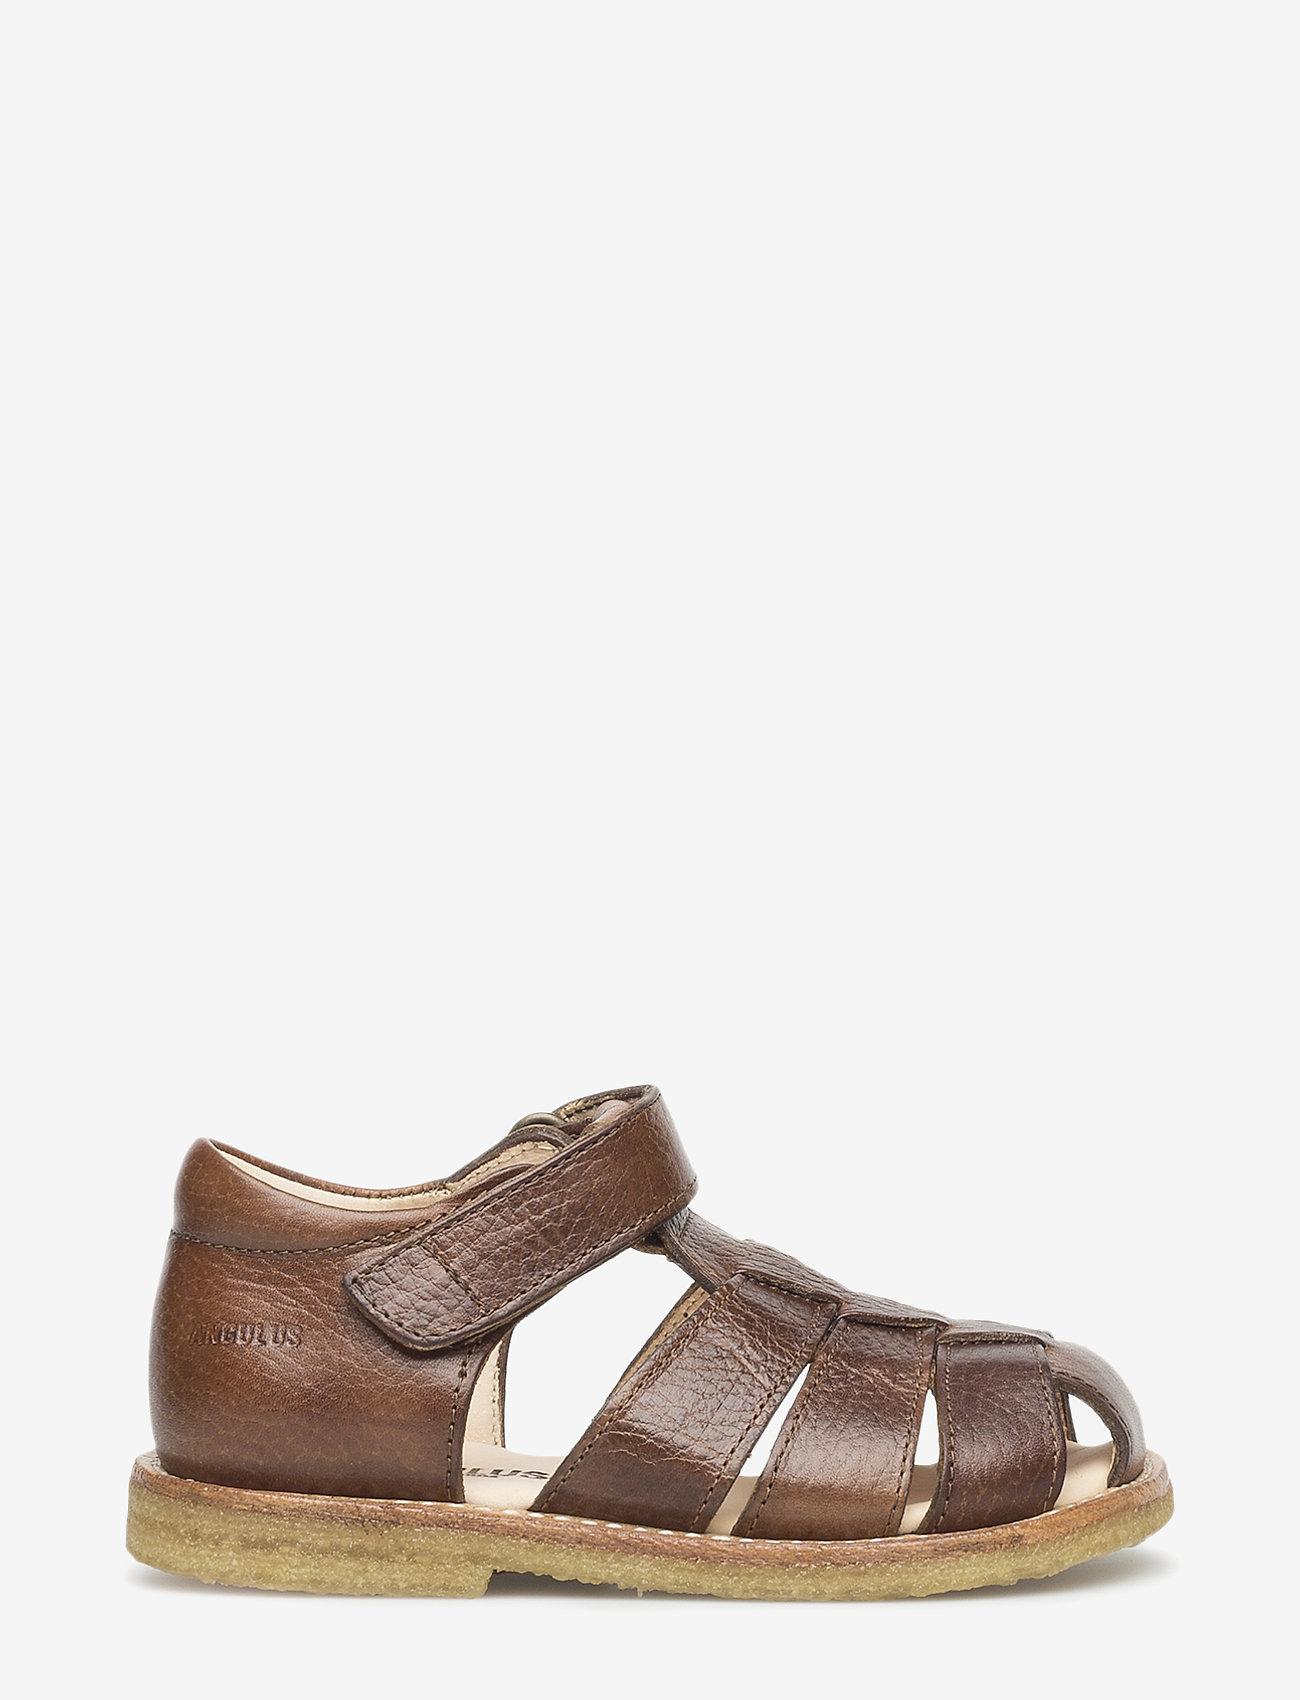 ANGULUS - Sandals - flat - closed toe -  - remsandaler - 2509 cognac - 1